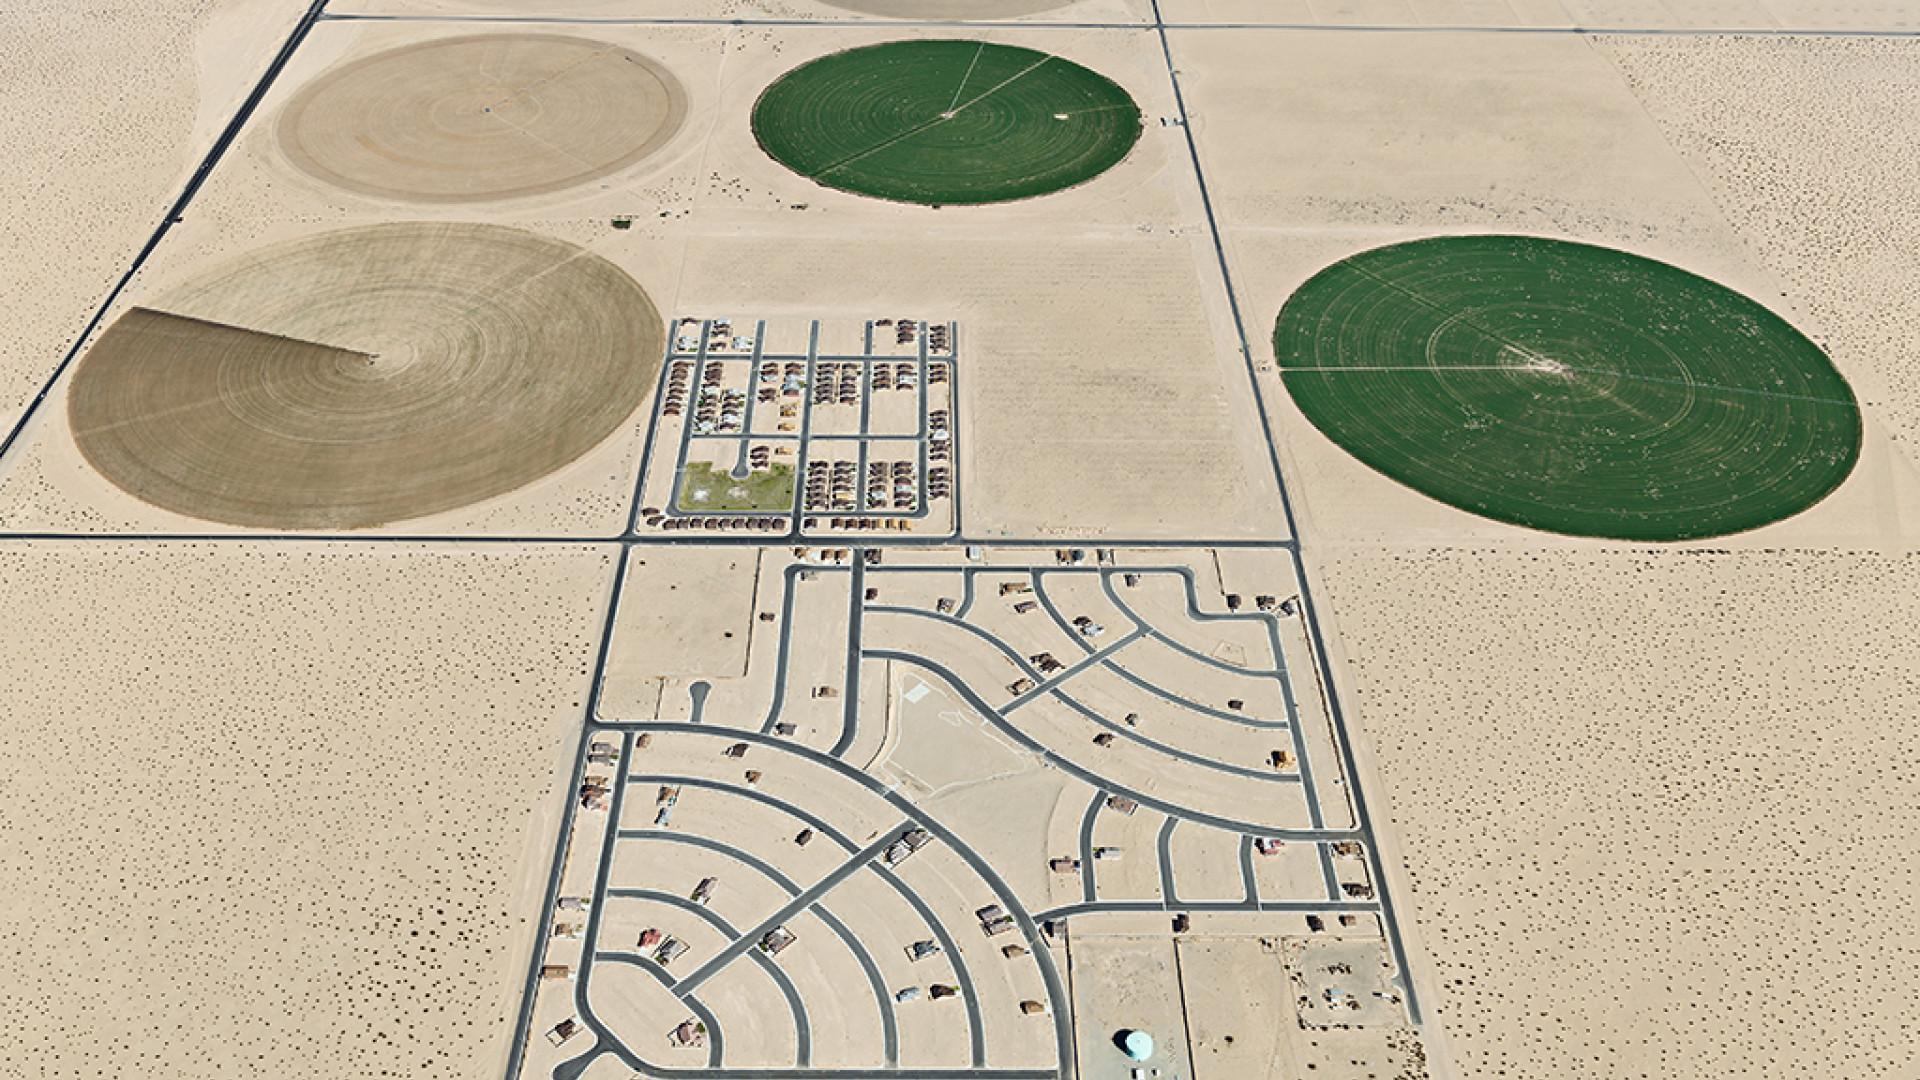 Farming and irrigation tools in Yuma, Arizona